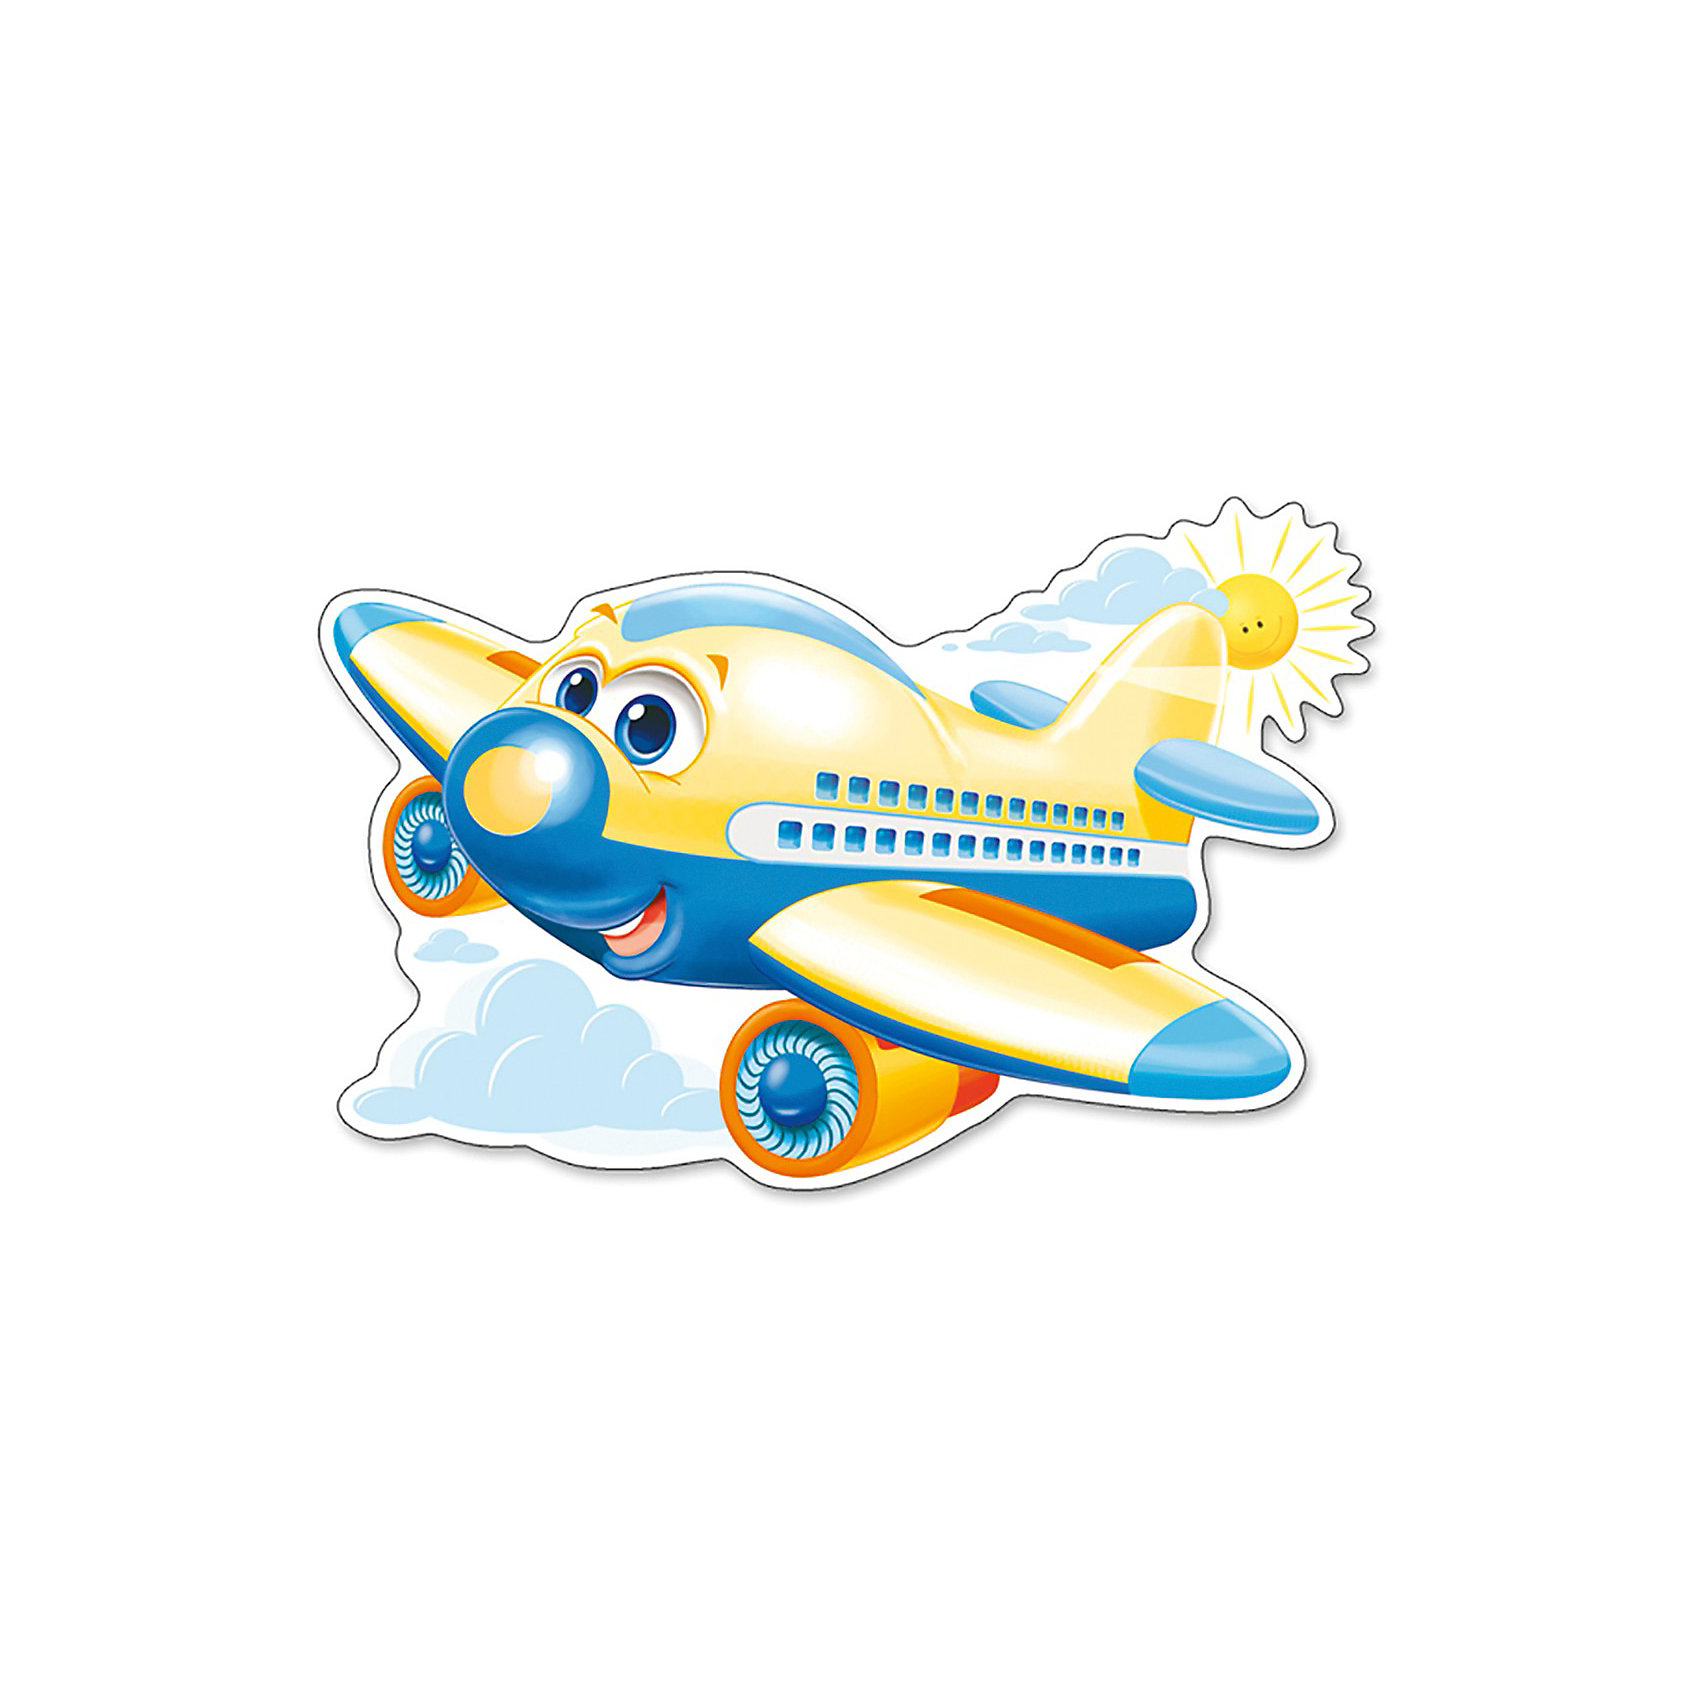 Castorland Пазл  Солнечный полет, 12 деталей MAXI, Castorland castorland пазл летний полет winx club 60 деталей castorland